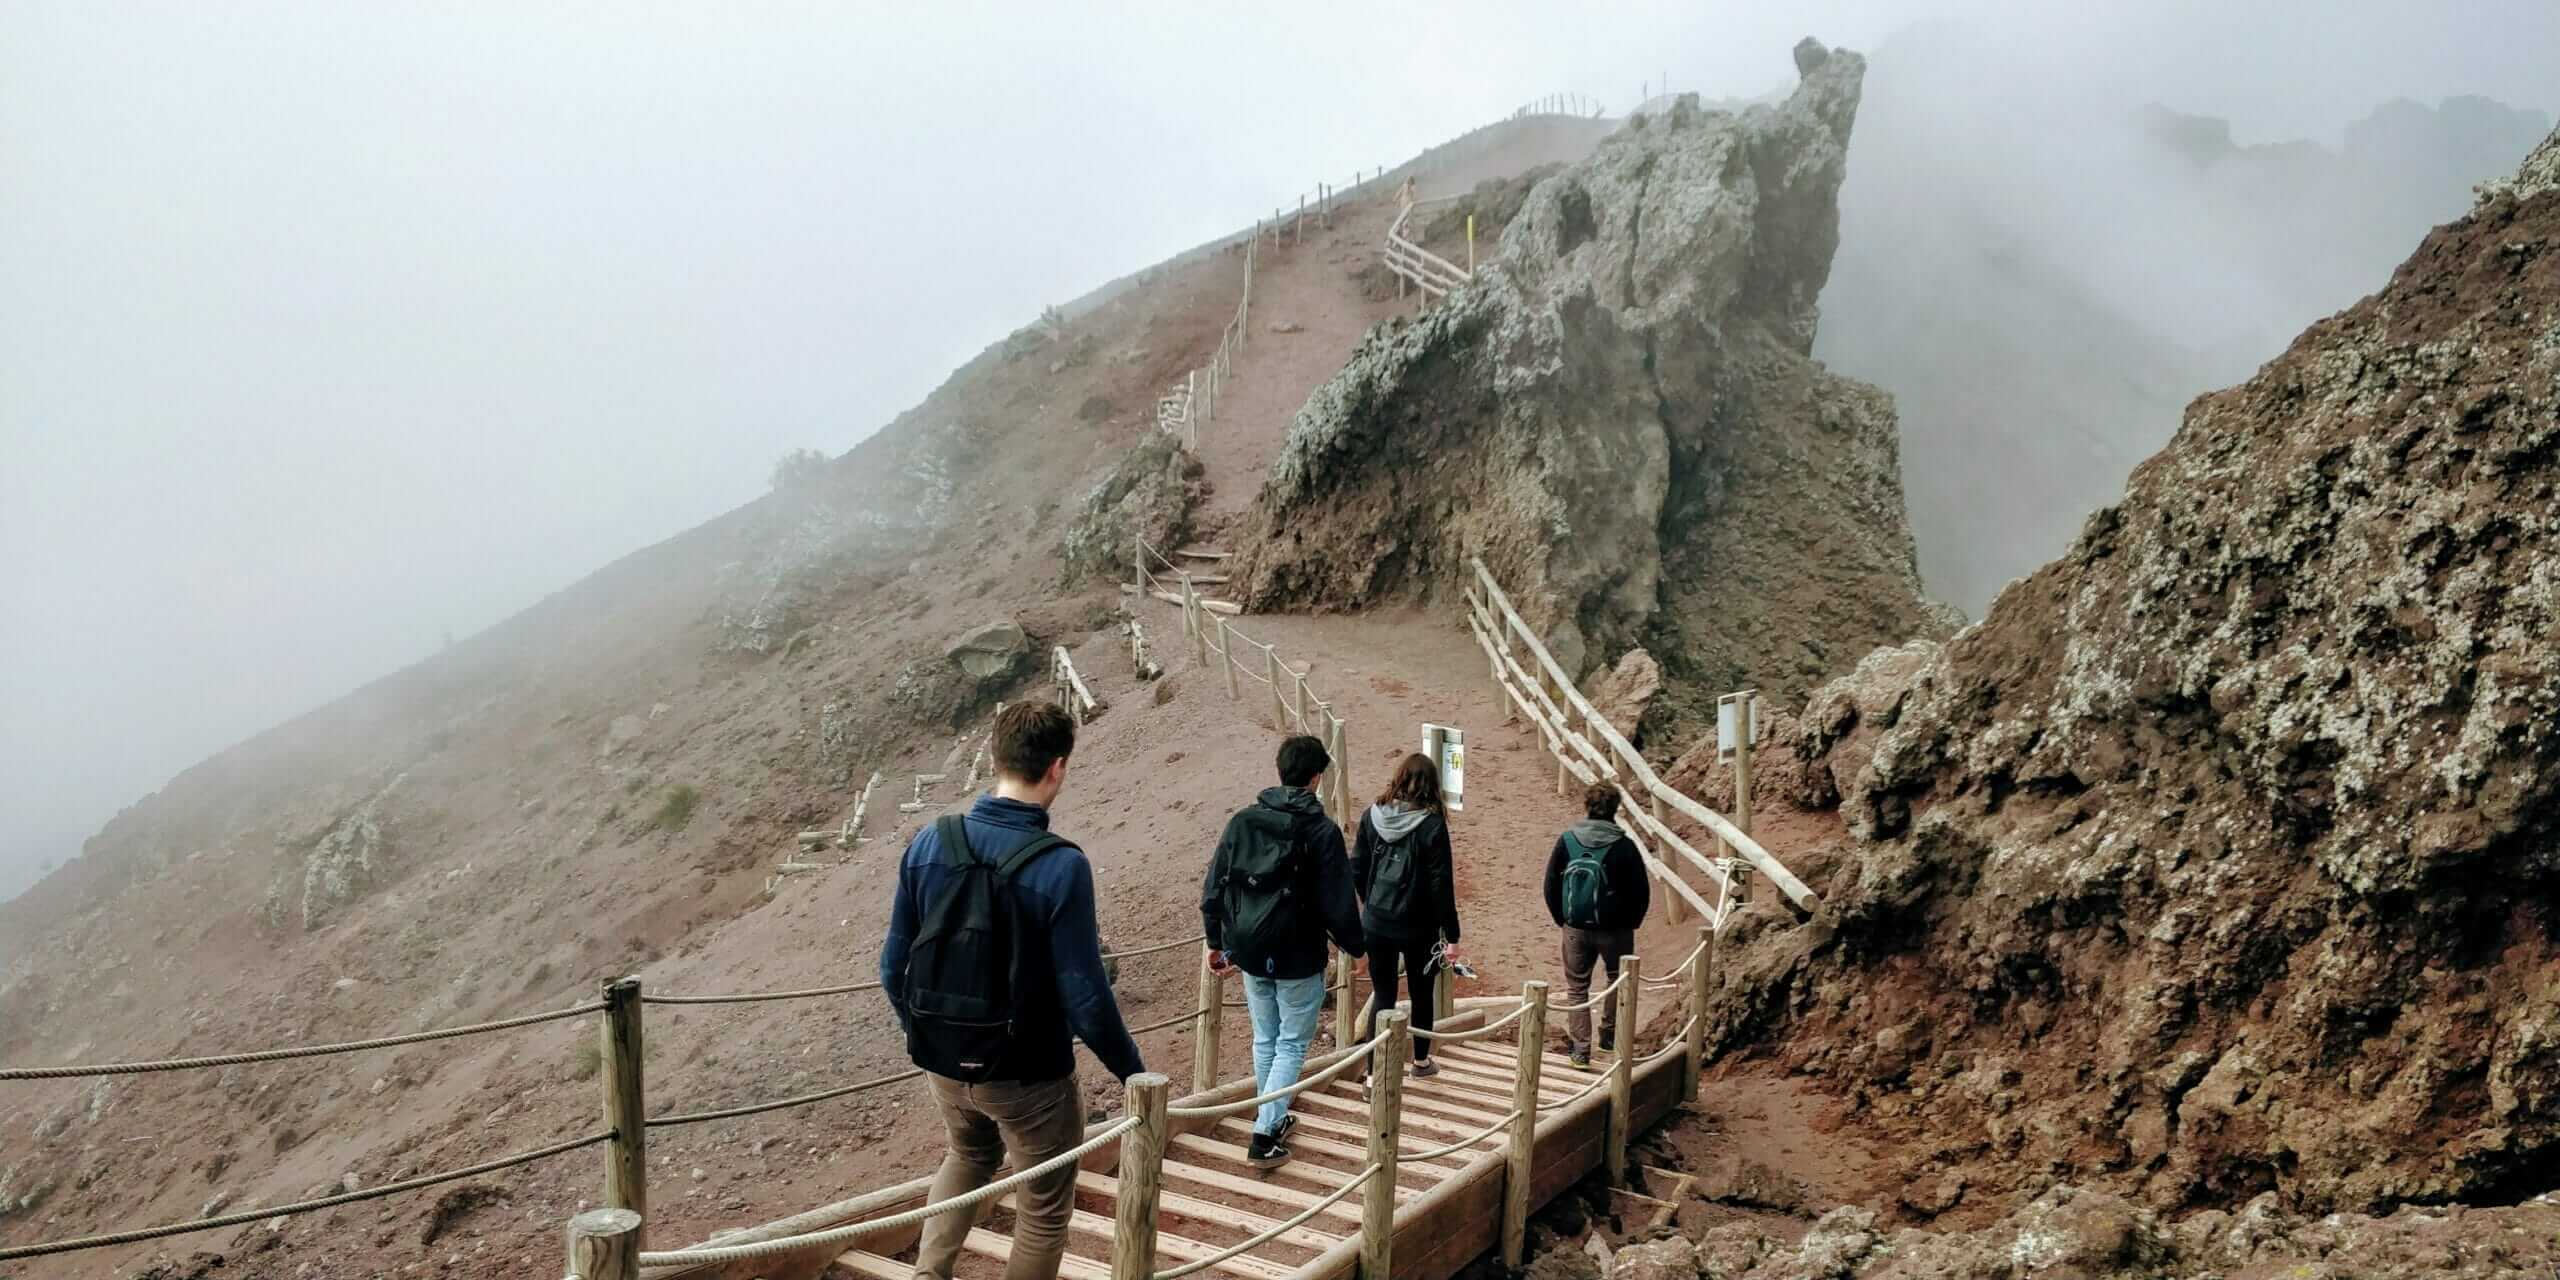 Hiking around Mount Vesuvius volcano crater ridge